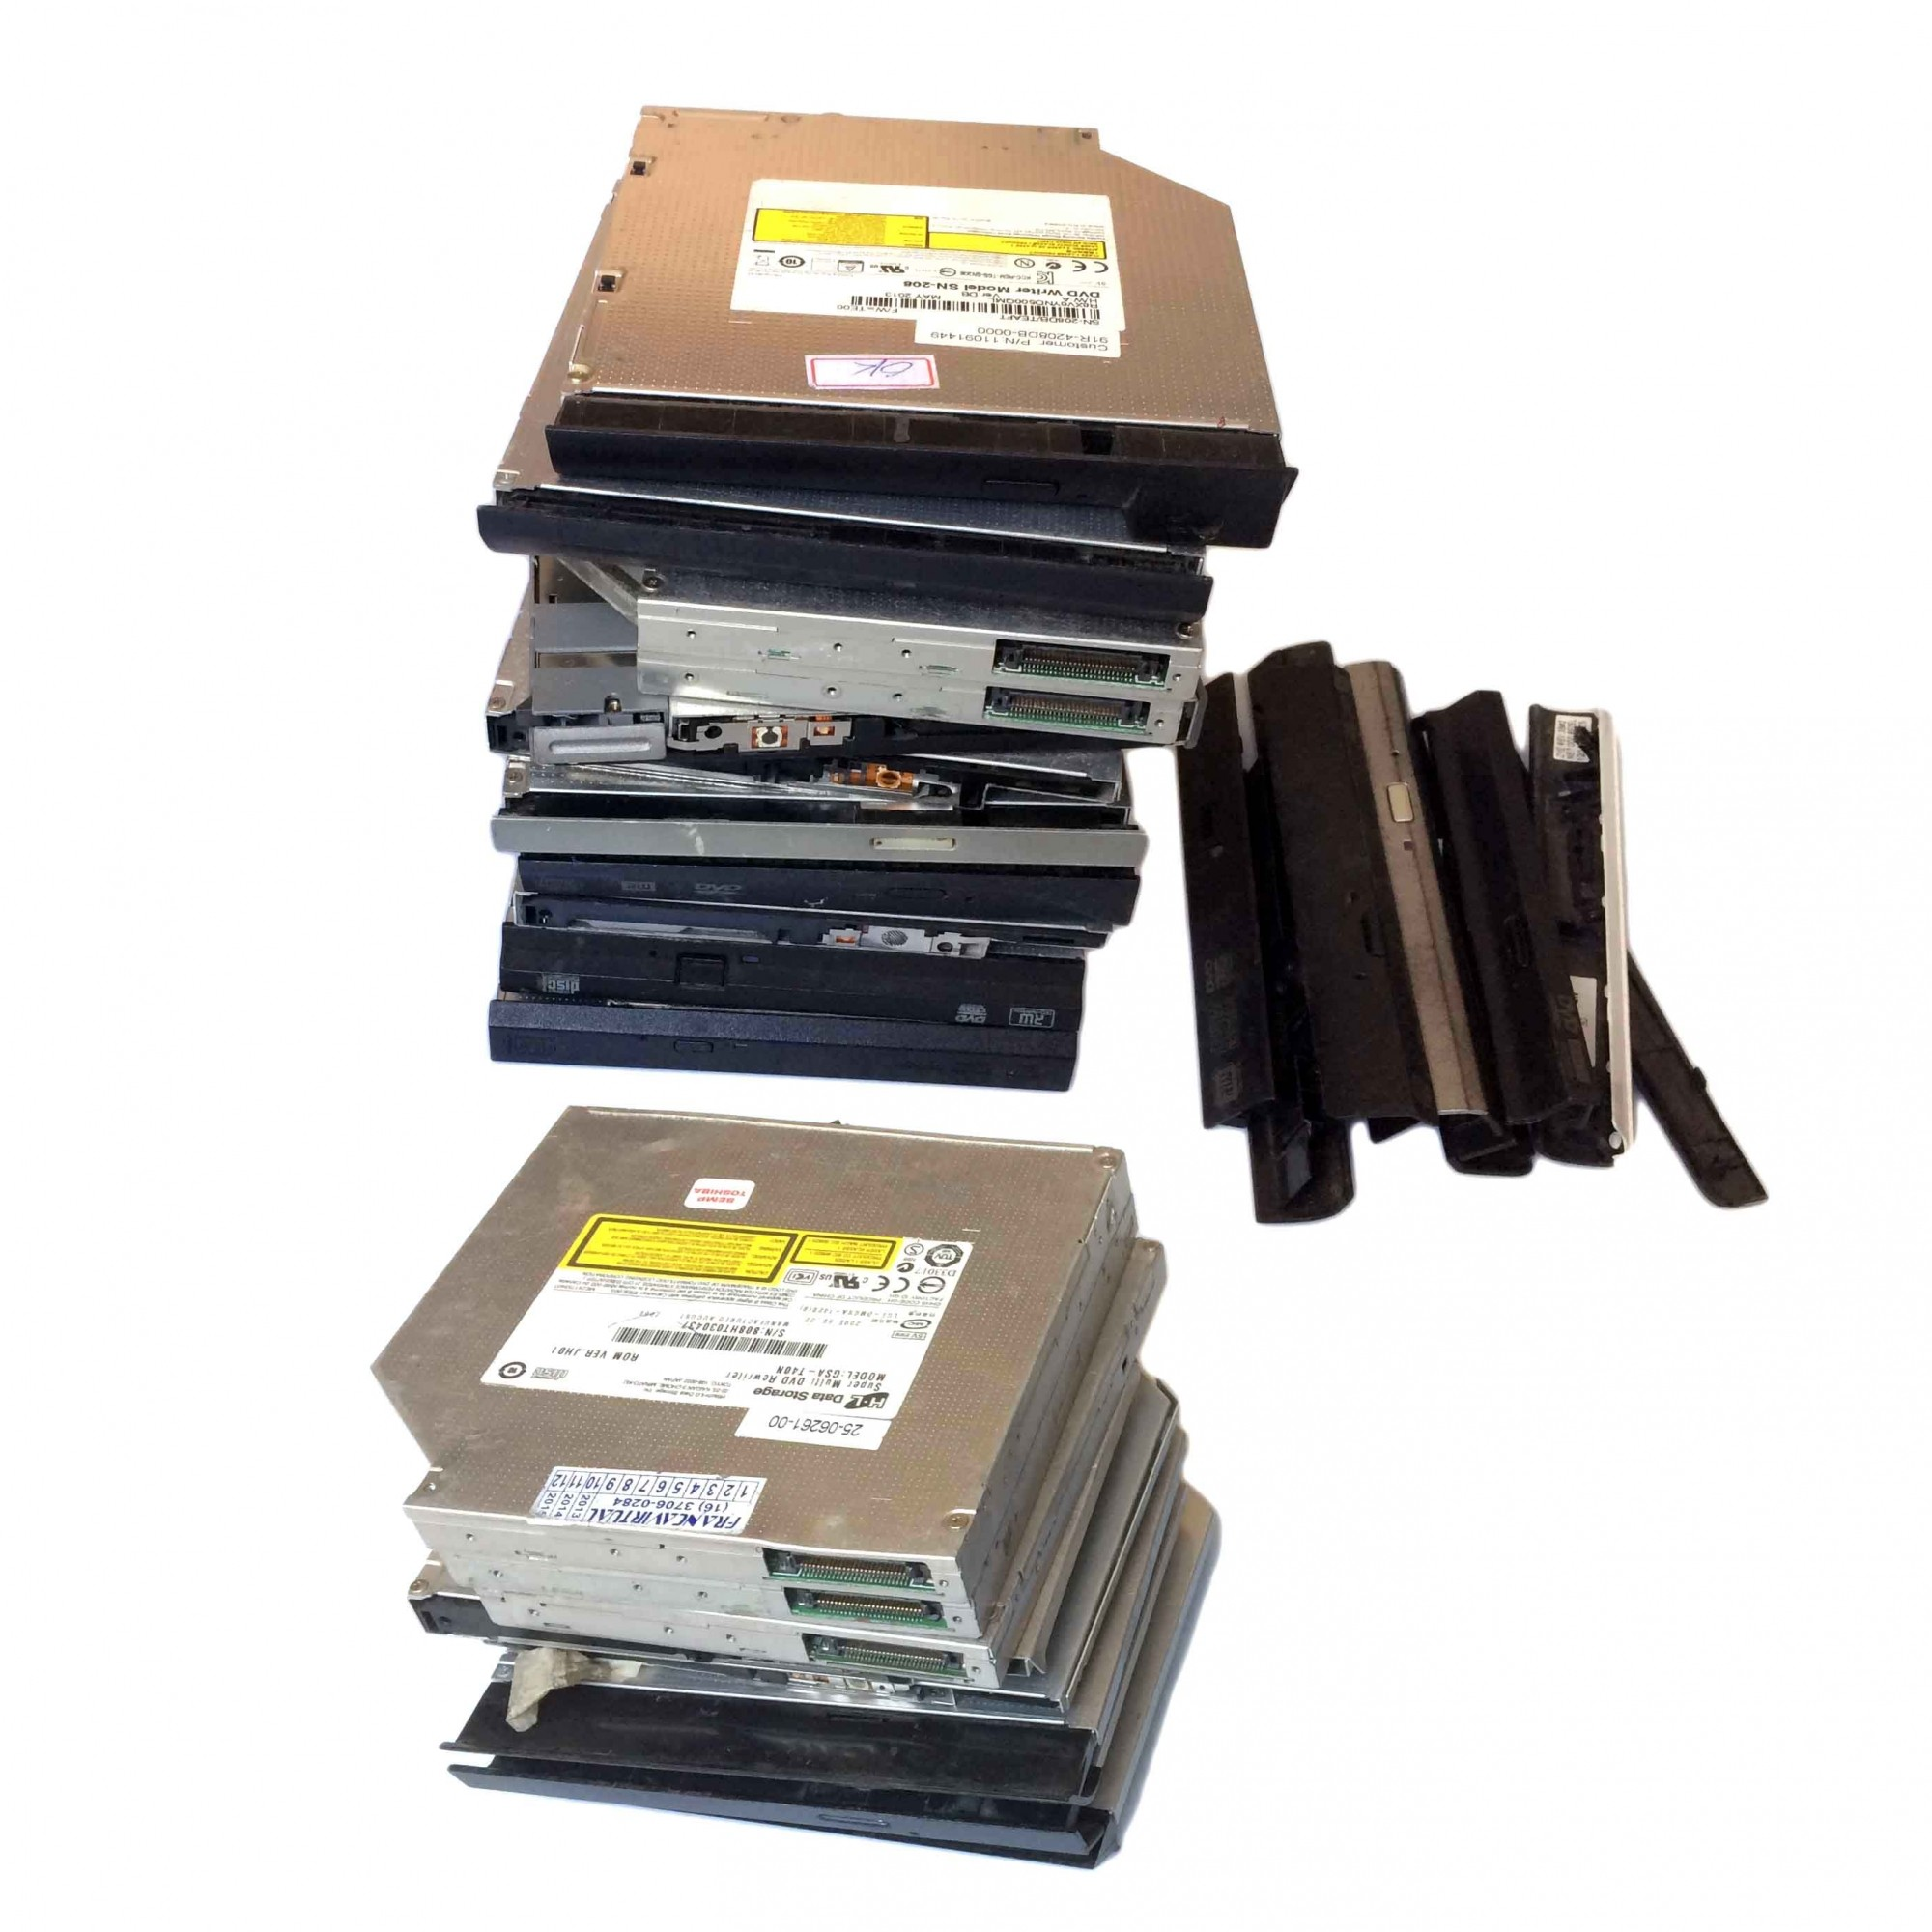 Lote C/ 19  Gravadores DVD P/ Notebook Diversos modelos e marcas - Retirado